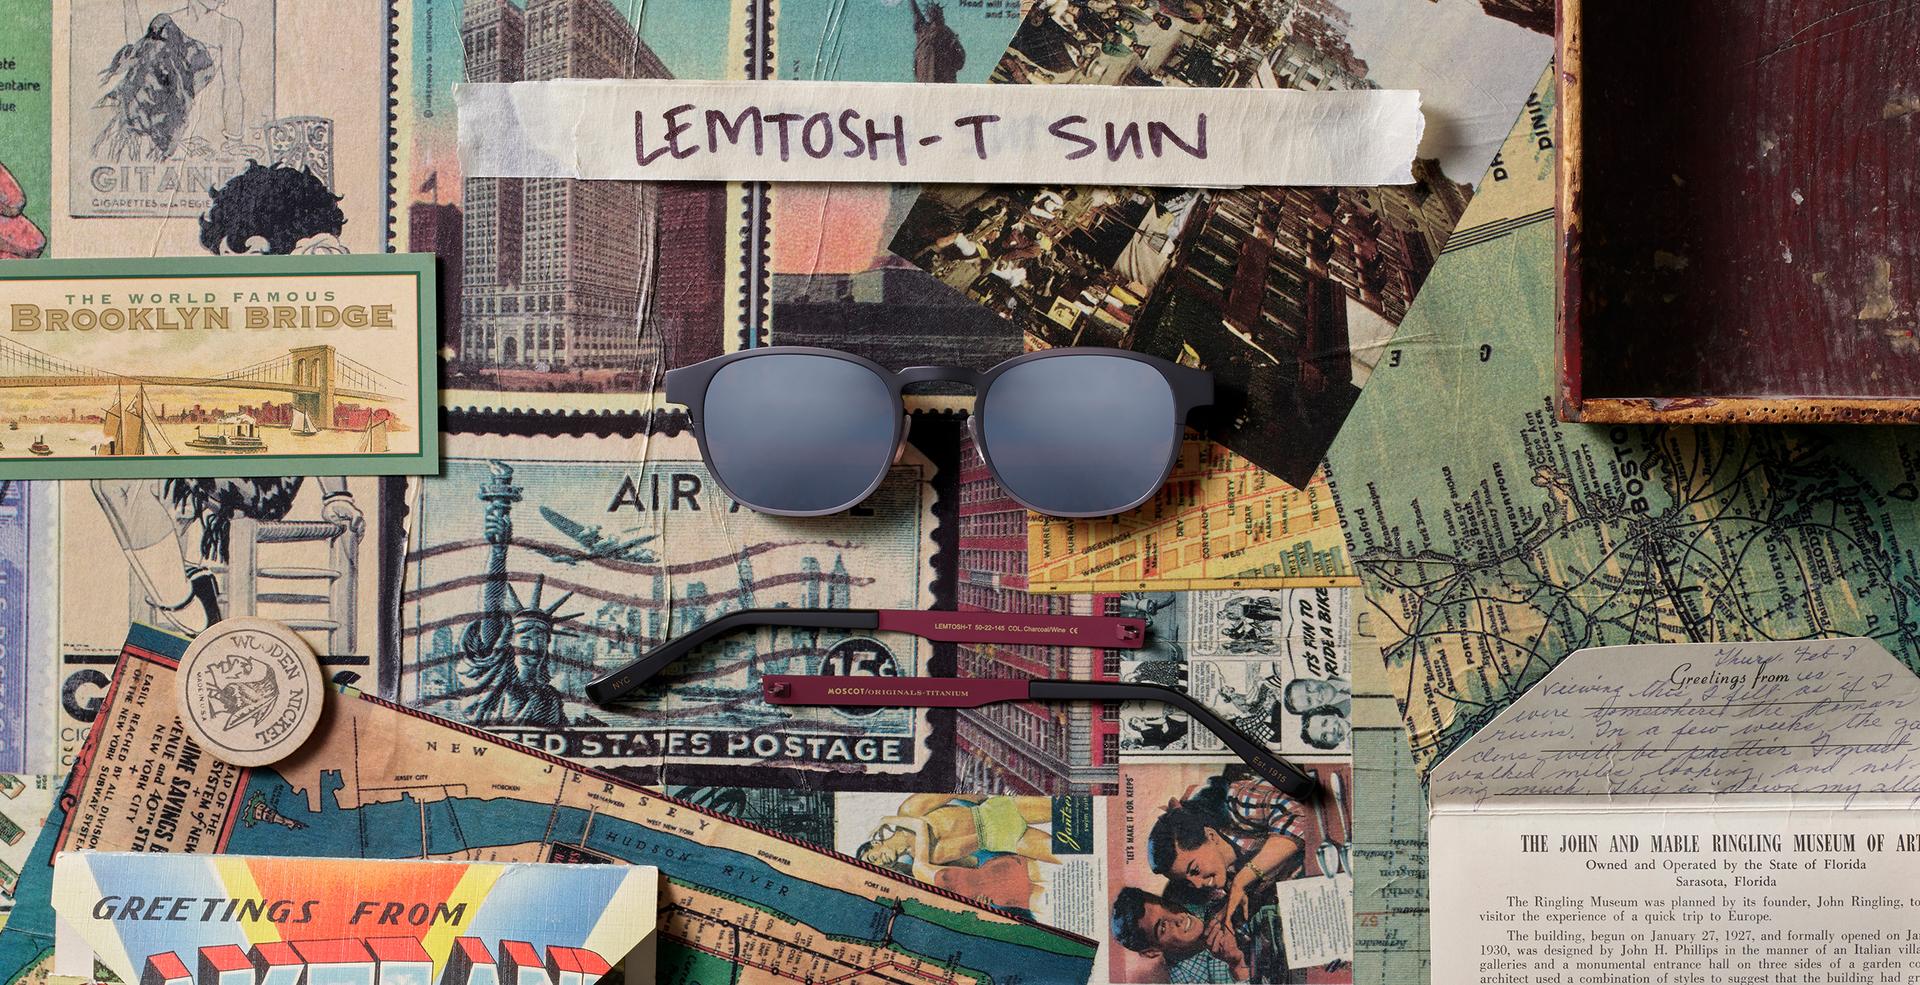 LEMTOSH-T SUN